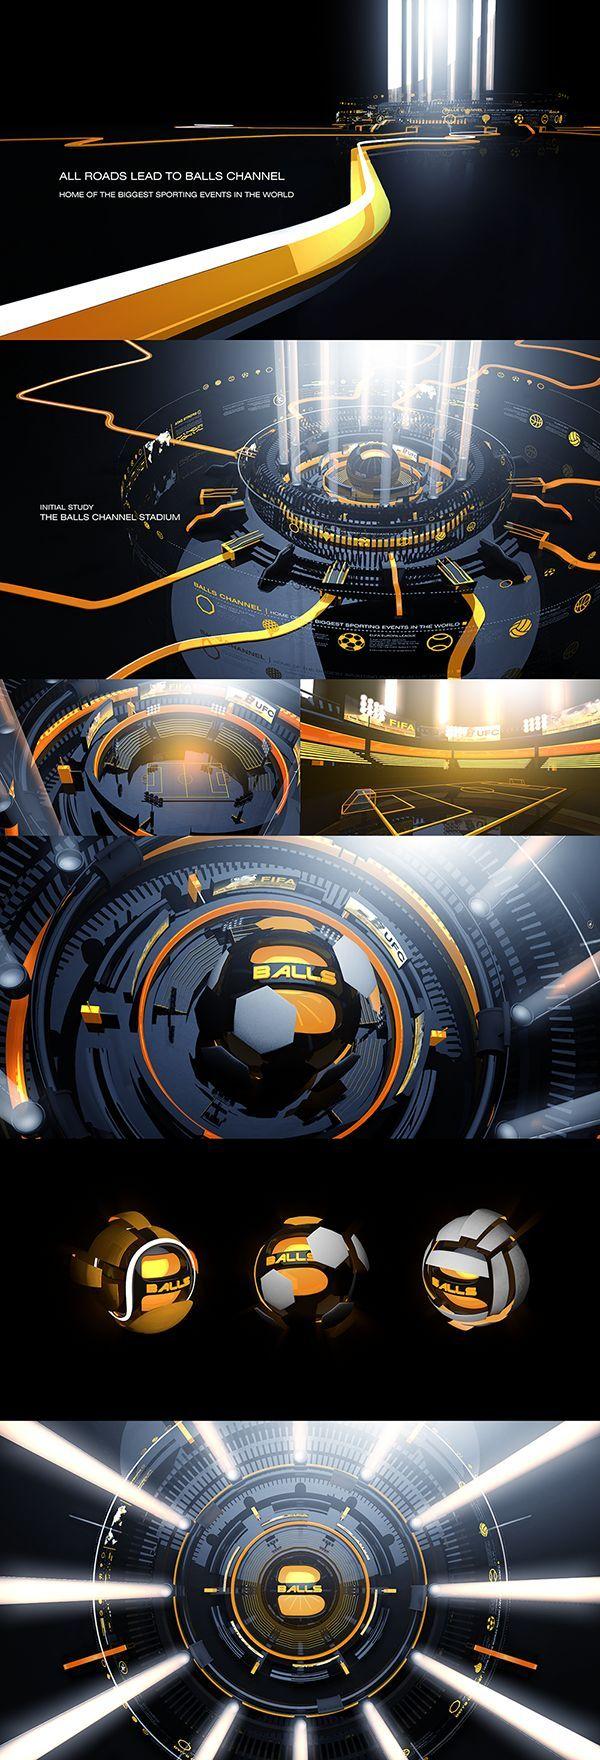 Balls Channel Re-Imaging 2014 on Behance: